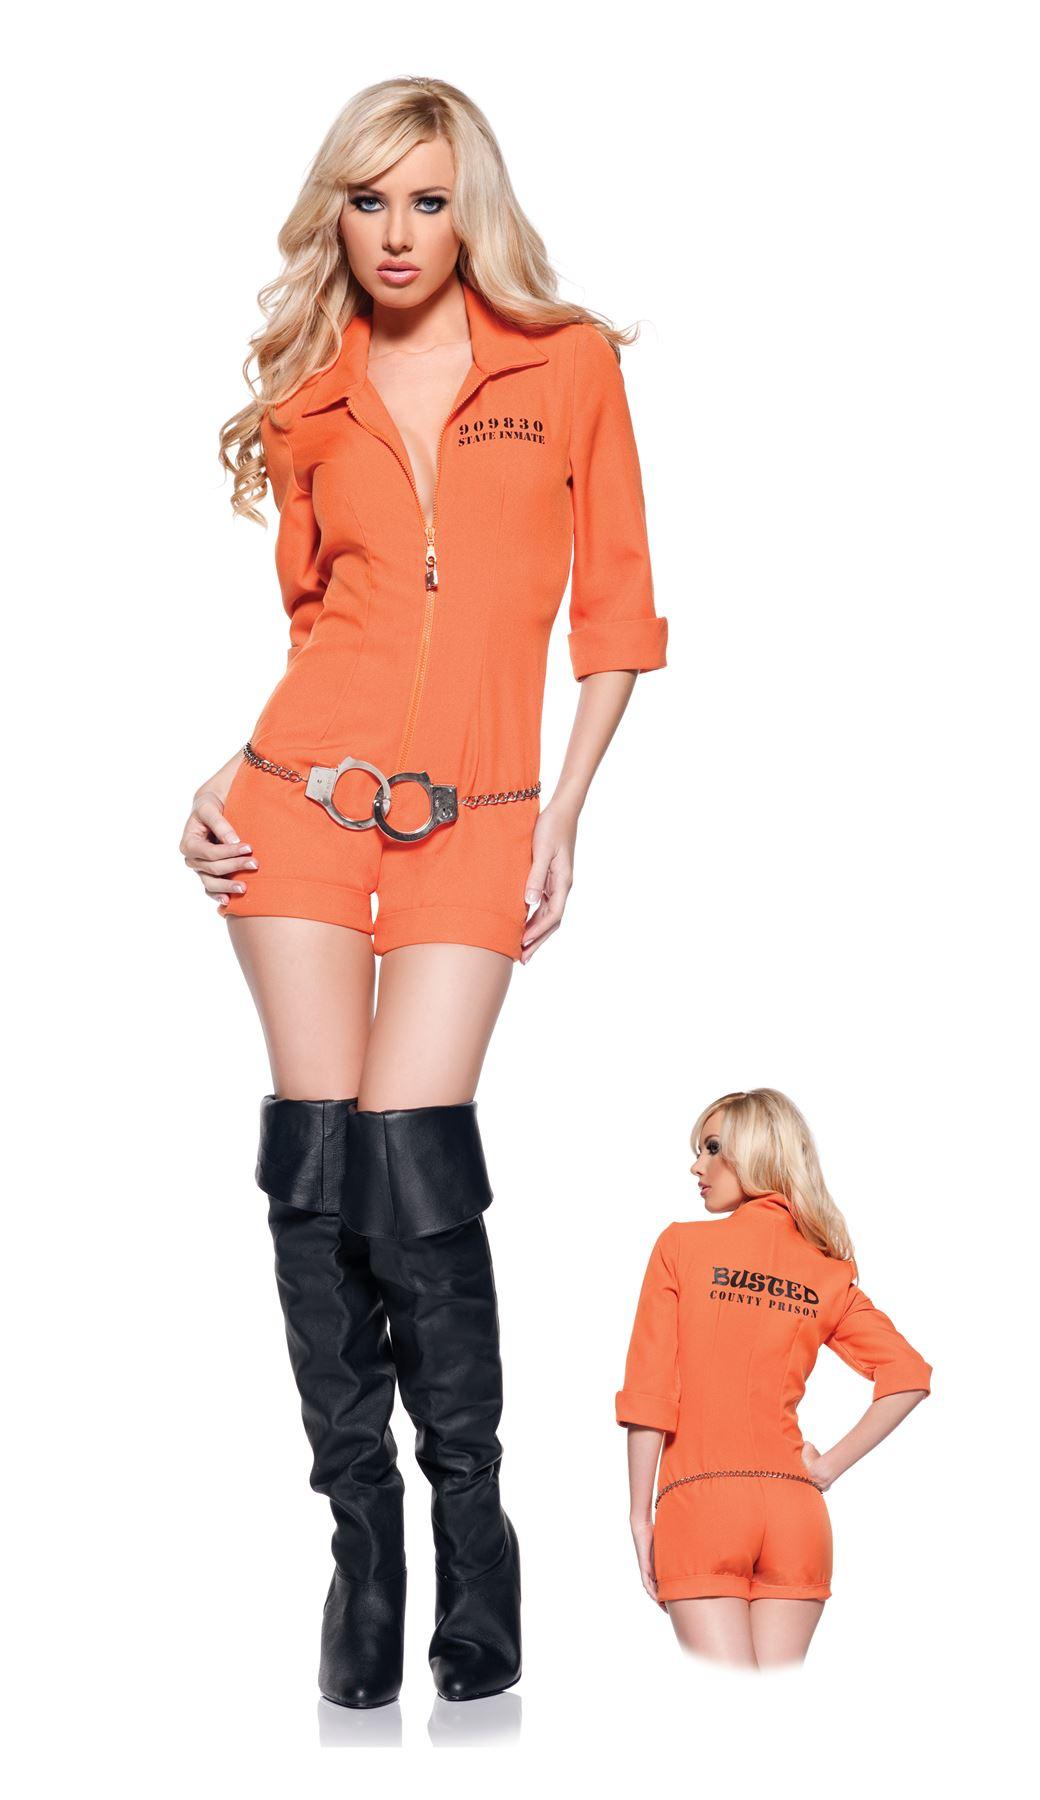 Sexy Orange Prison Jumpsuit Womens Costume | eBay